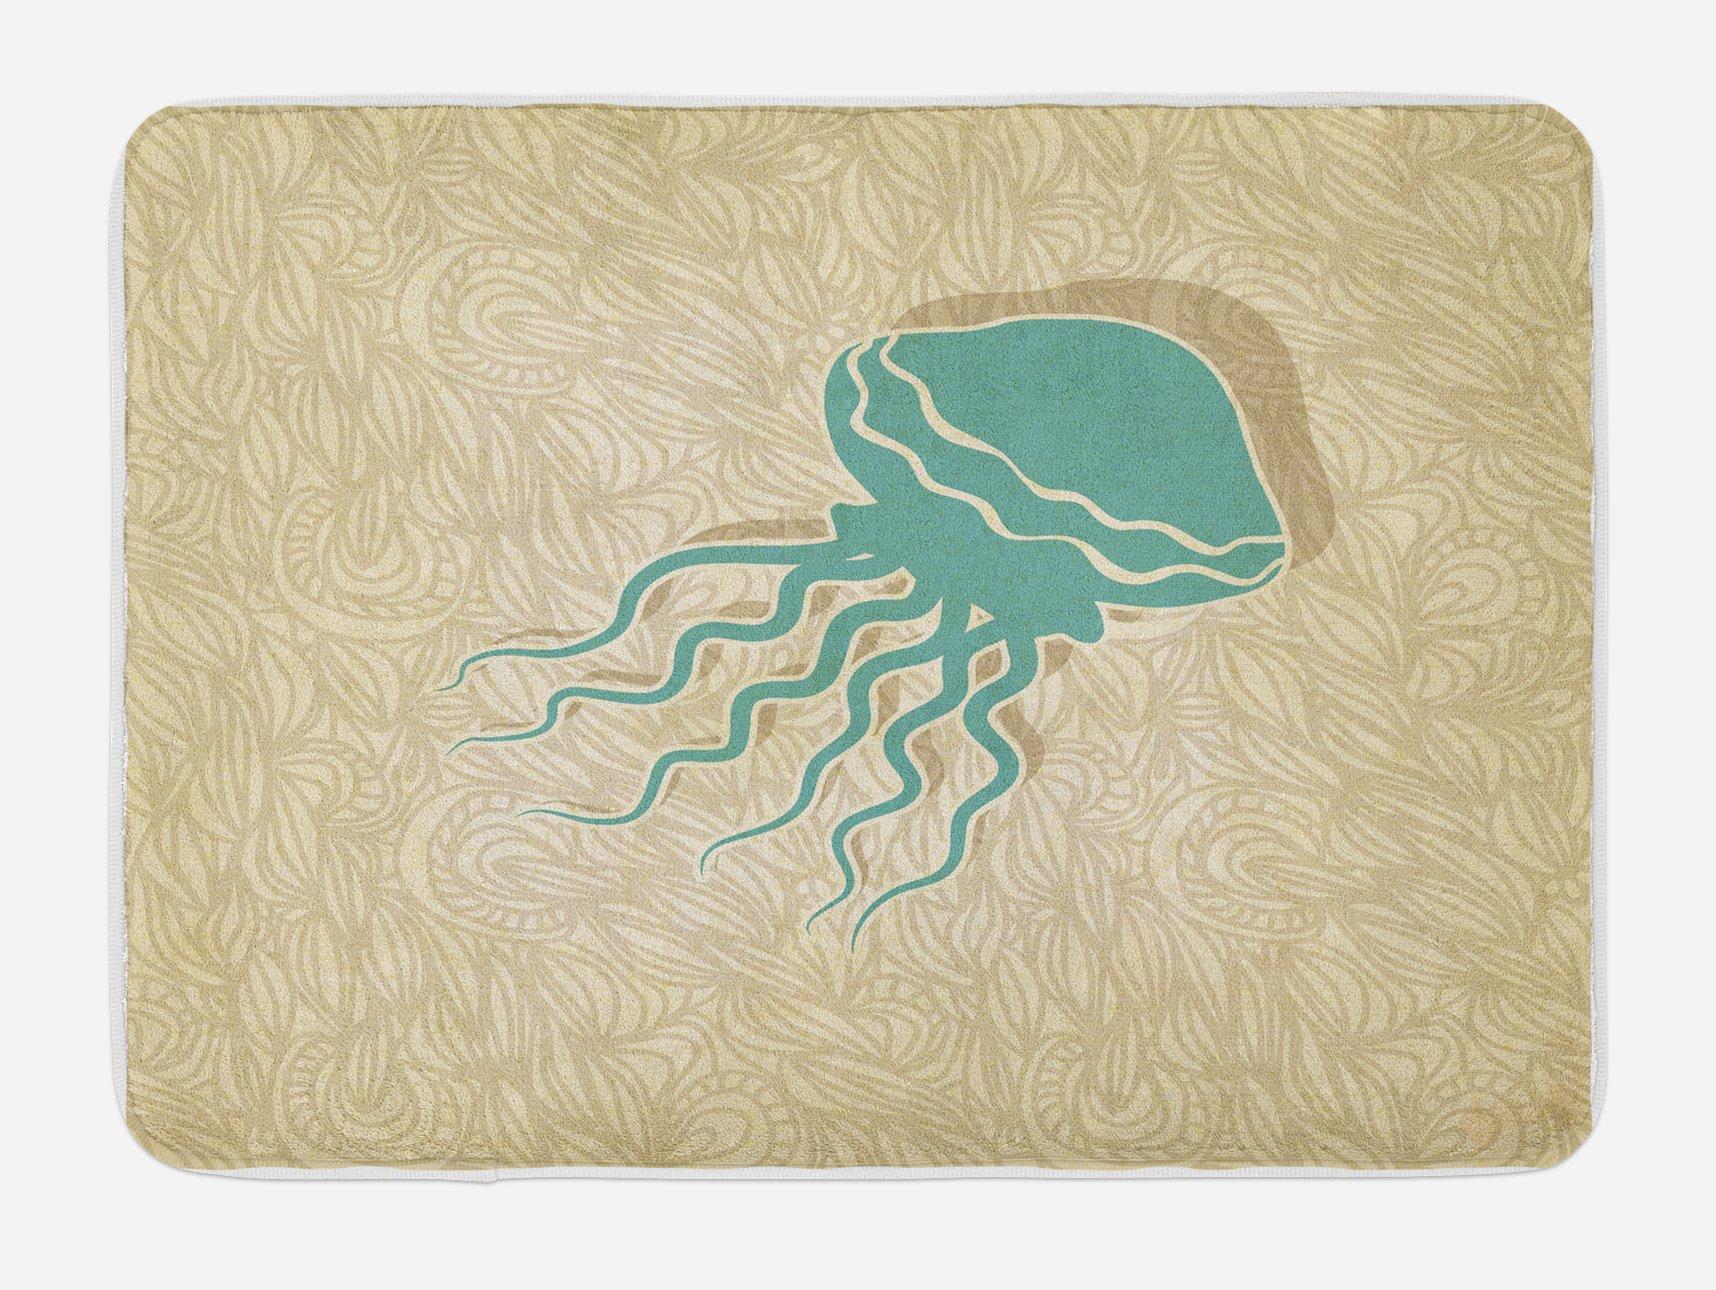 Ambesonne Jellyfish Bath Mat, Beach Summer Oceanic Life Tropicalea Animal Nautical Abstract Pattern, Plush Bathroom Decor Mat with Non Slip Backing, 29.5 W X 17.5 W Inches, Sand Brown Seafoam